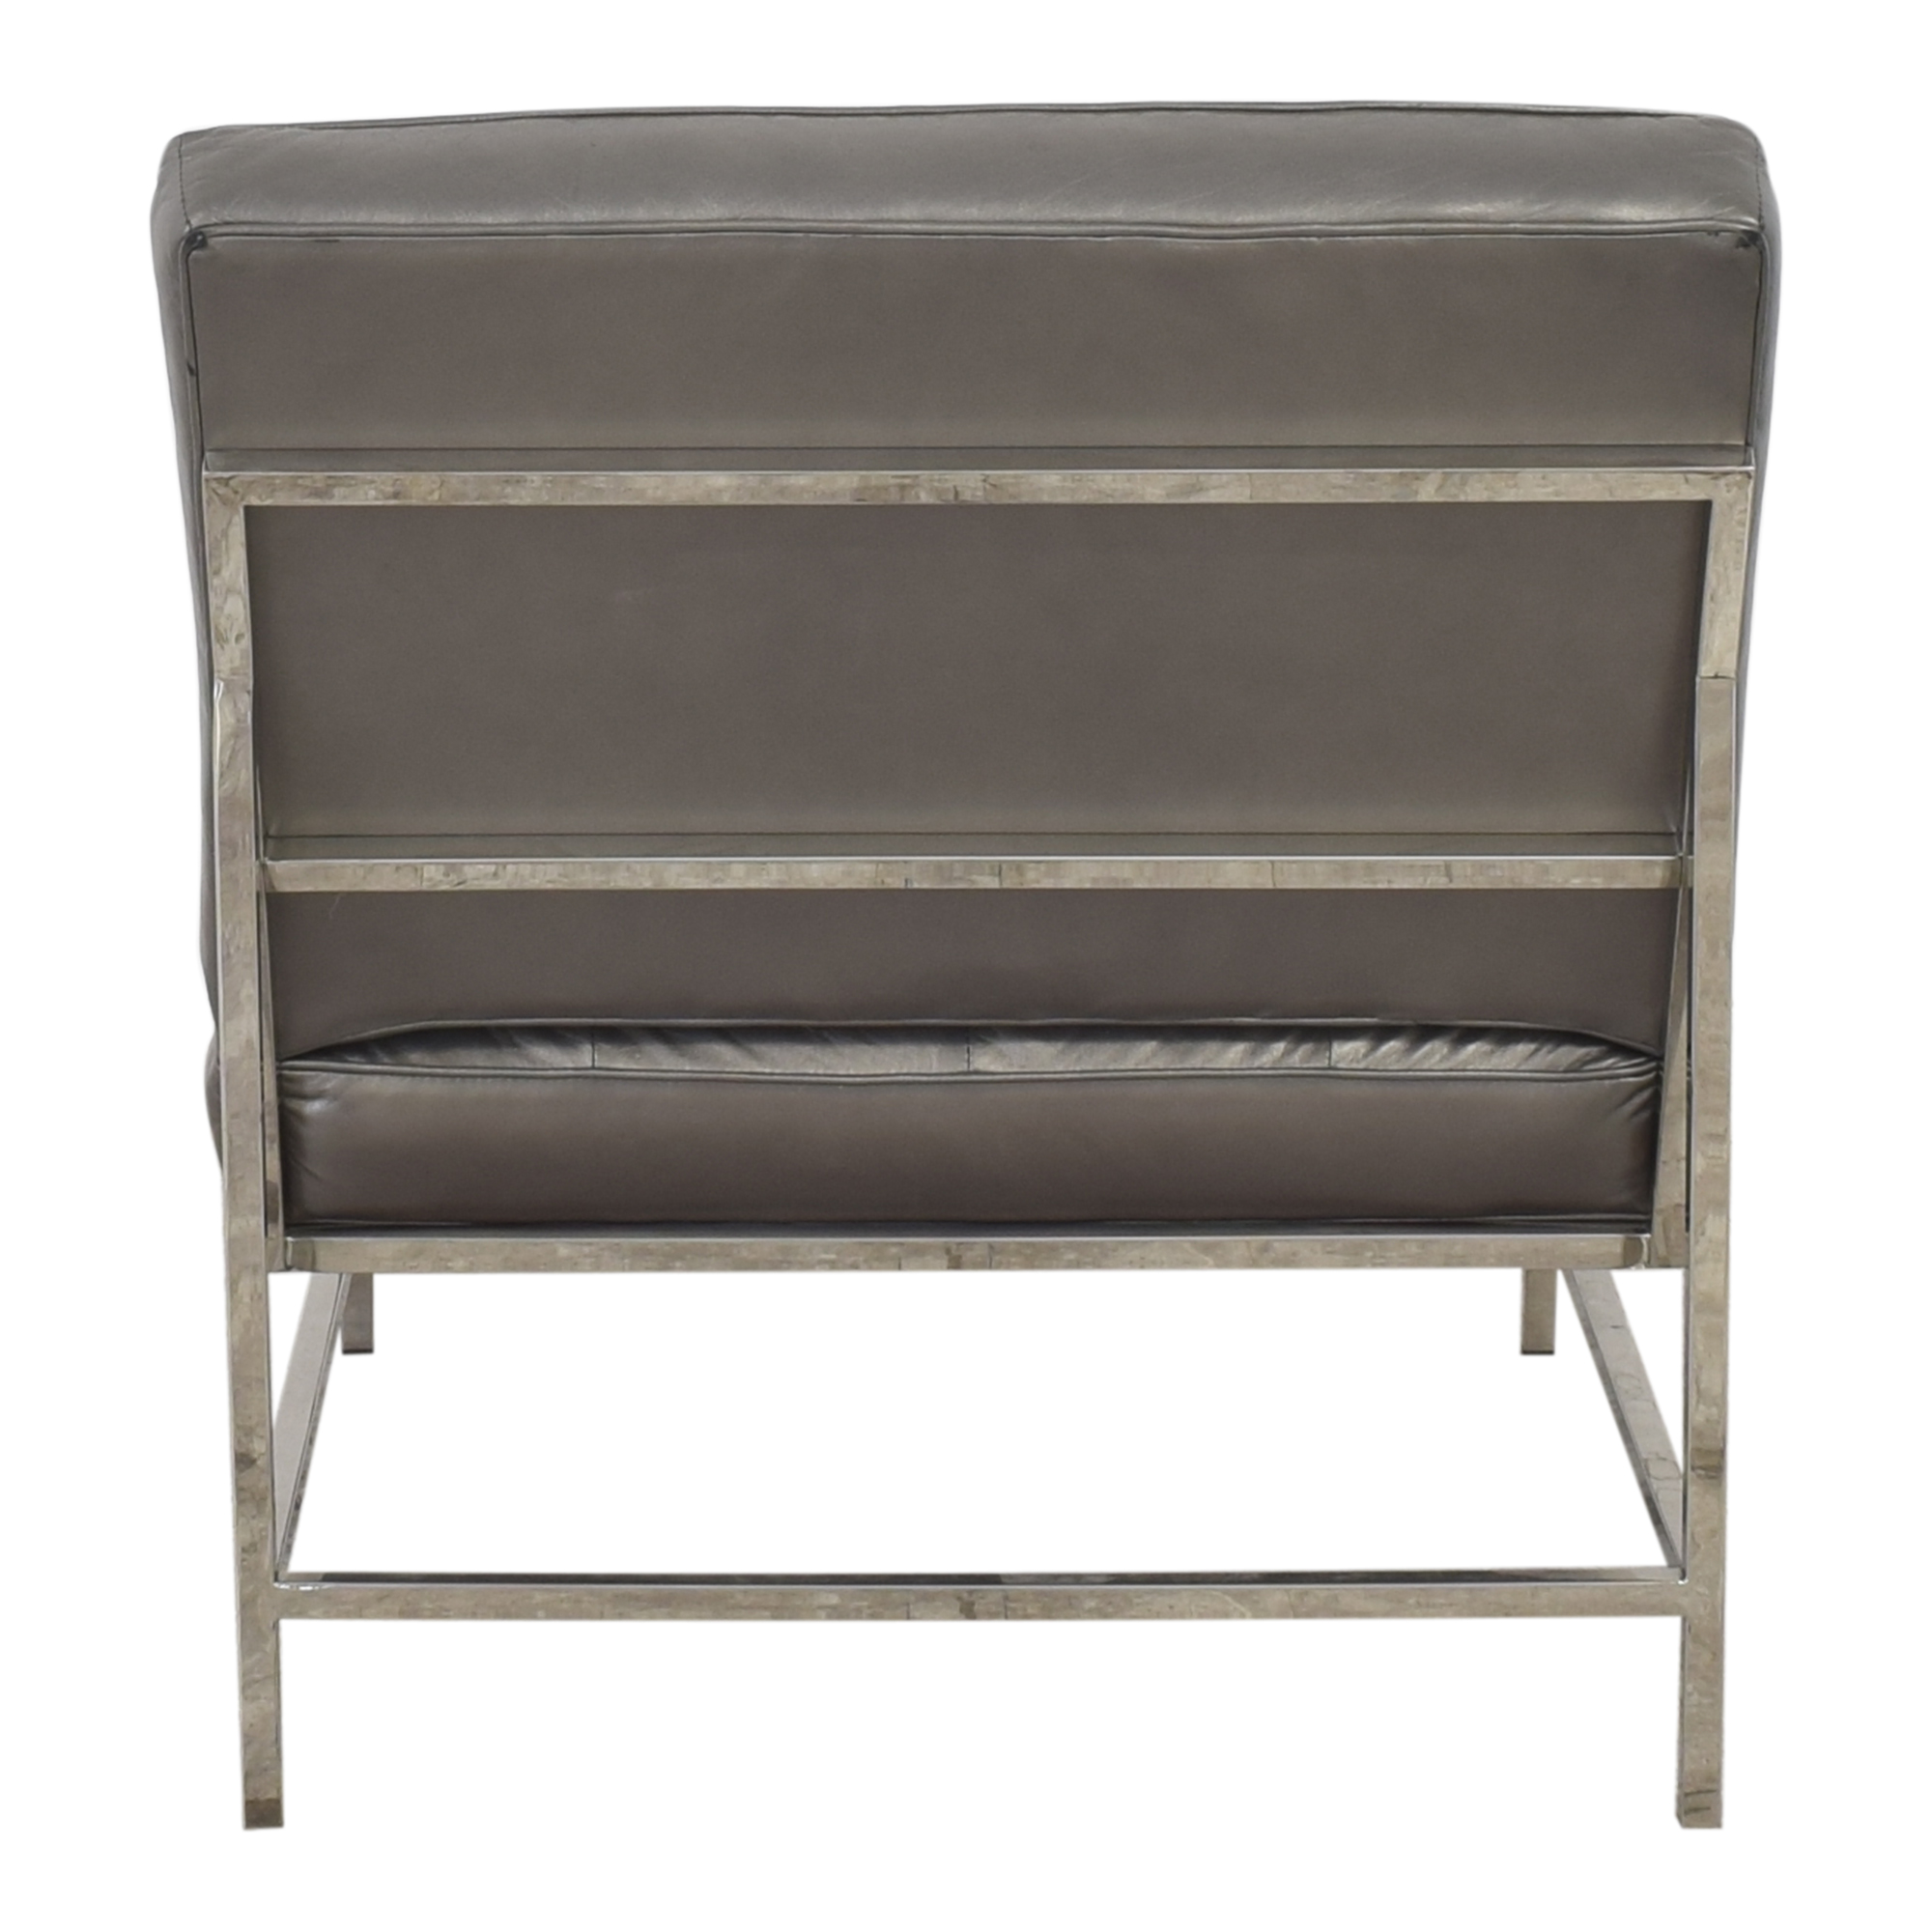 Mitchell Gold + Bob Williams Mitchell Gold + Bob Williams Major Lounge Chair dimensions